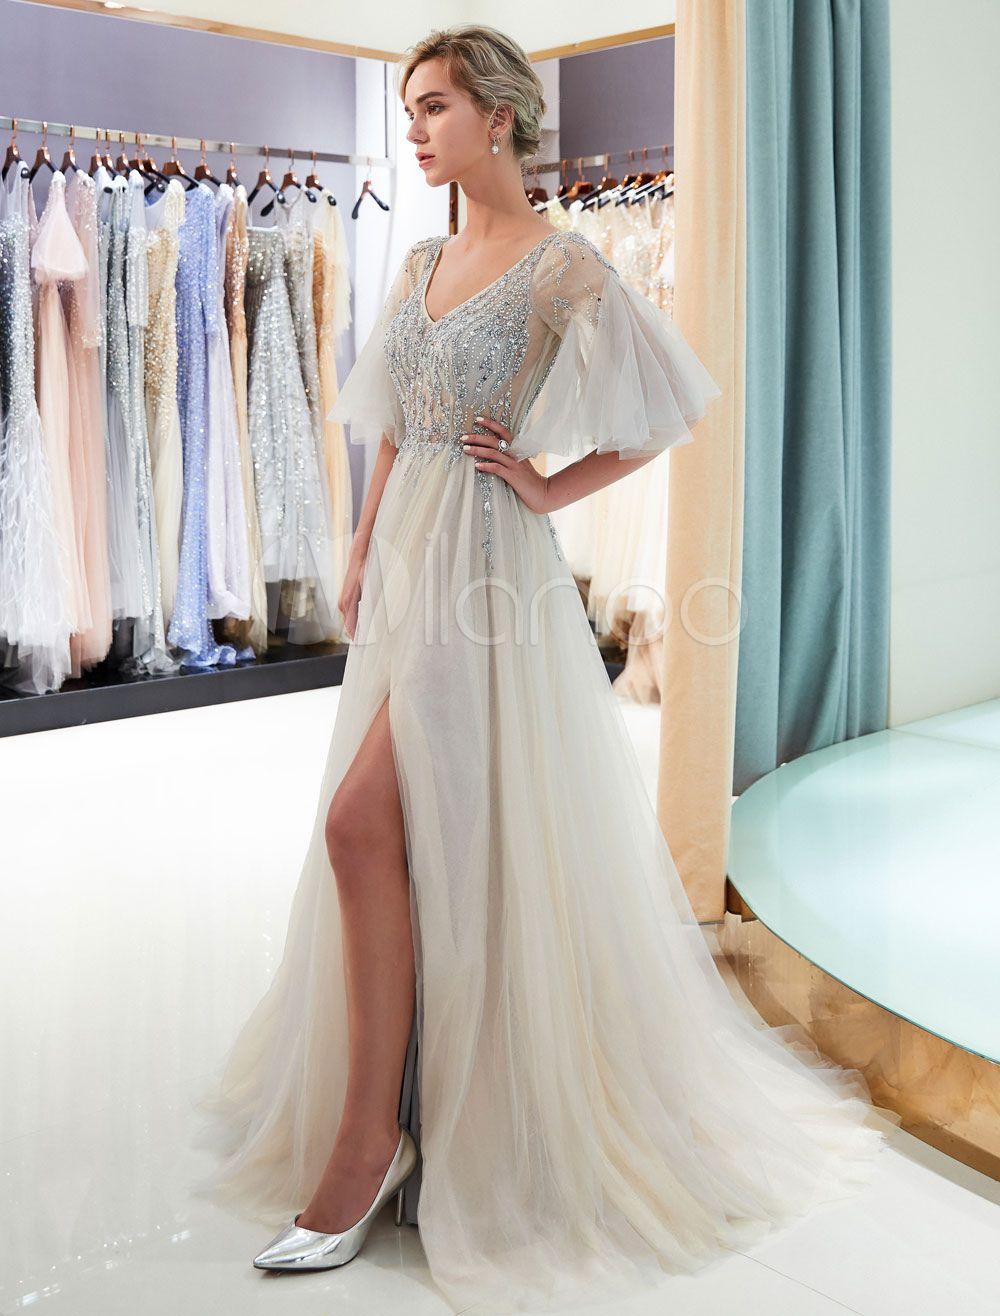 91a6b8ca3855f Prom Dresses Light Grey Beaded V Neck Half Sleeve Tulle A Line ...